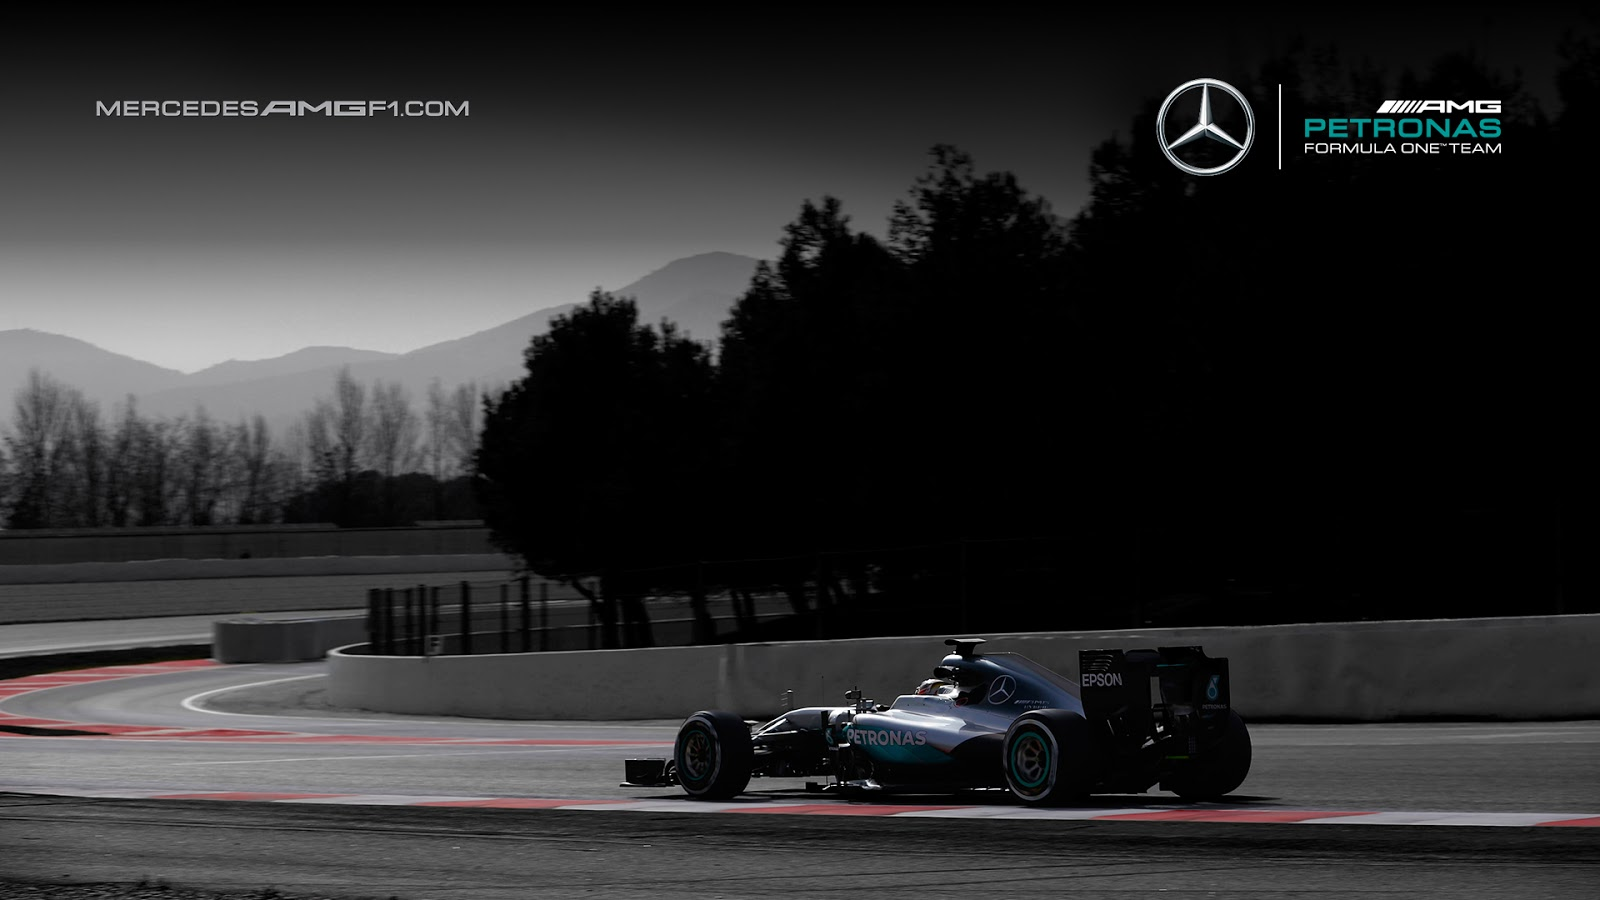 Mercedes Amg Petronas F1 Hd Hintergrundbilder 4k: Mercedes F1 Wallpapers